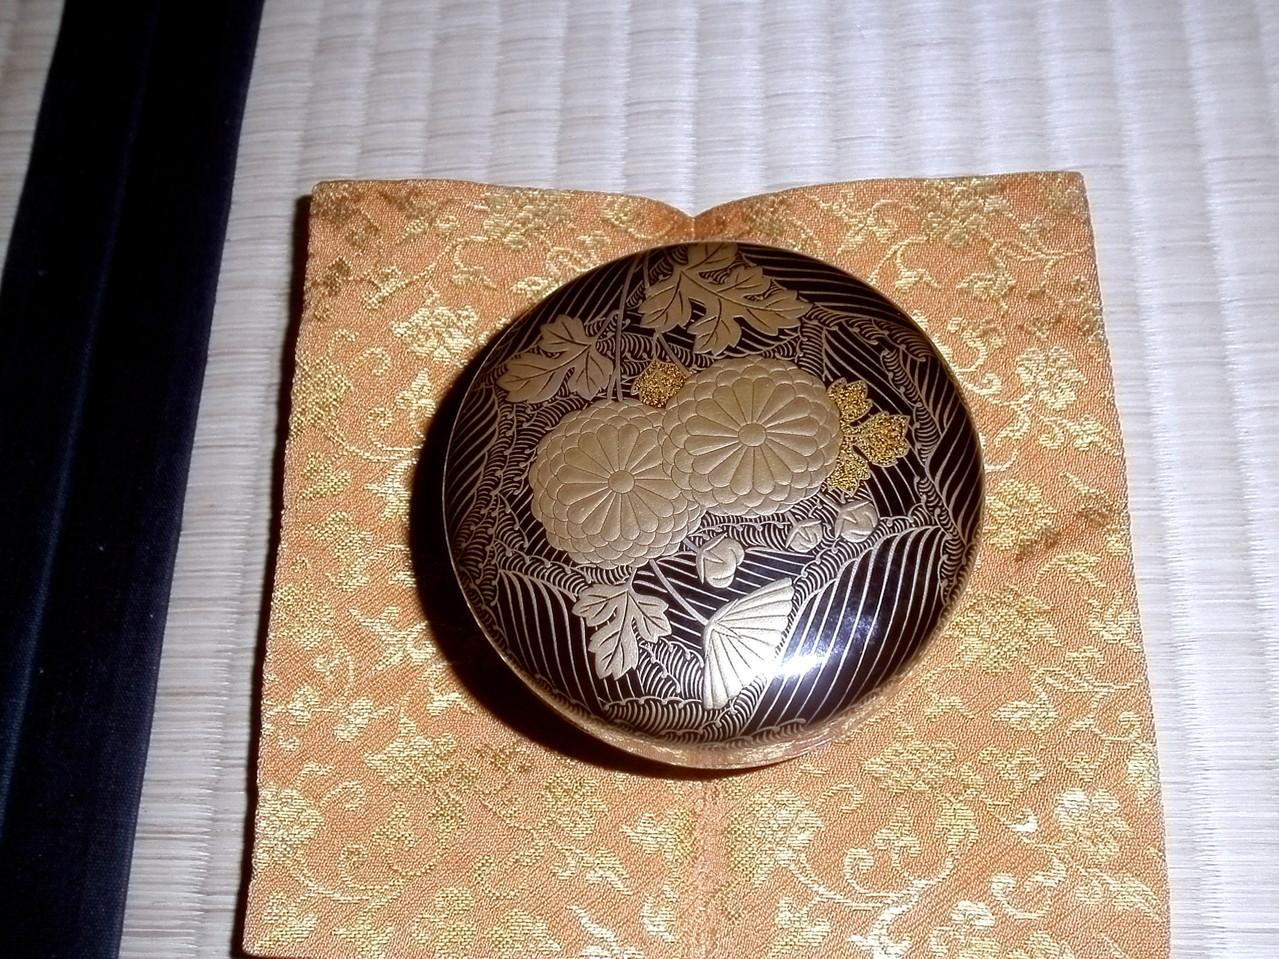 井波キ六斎